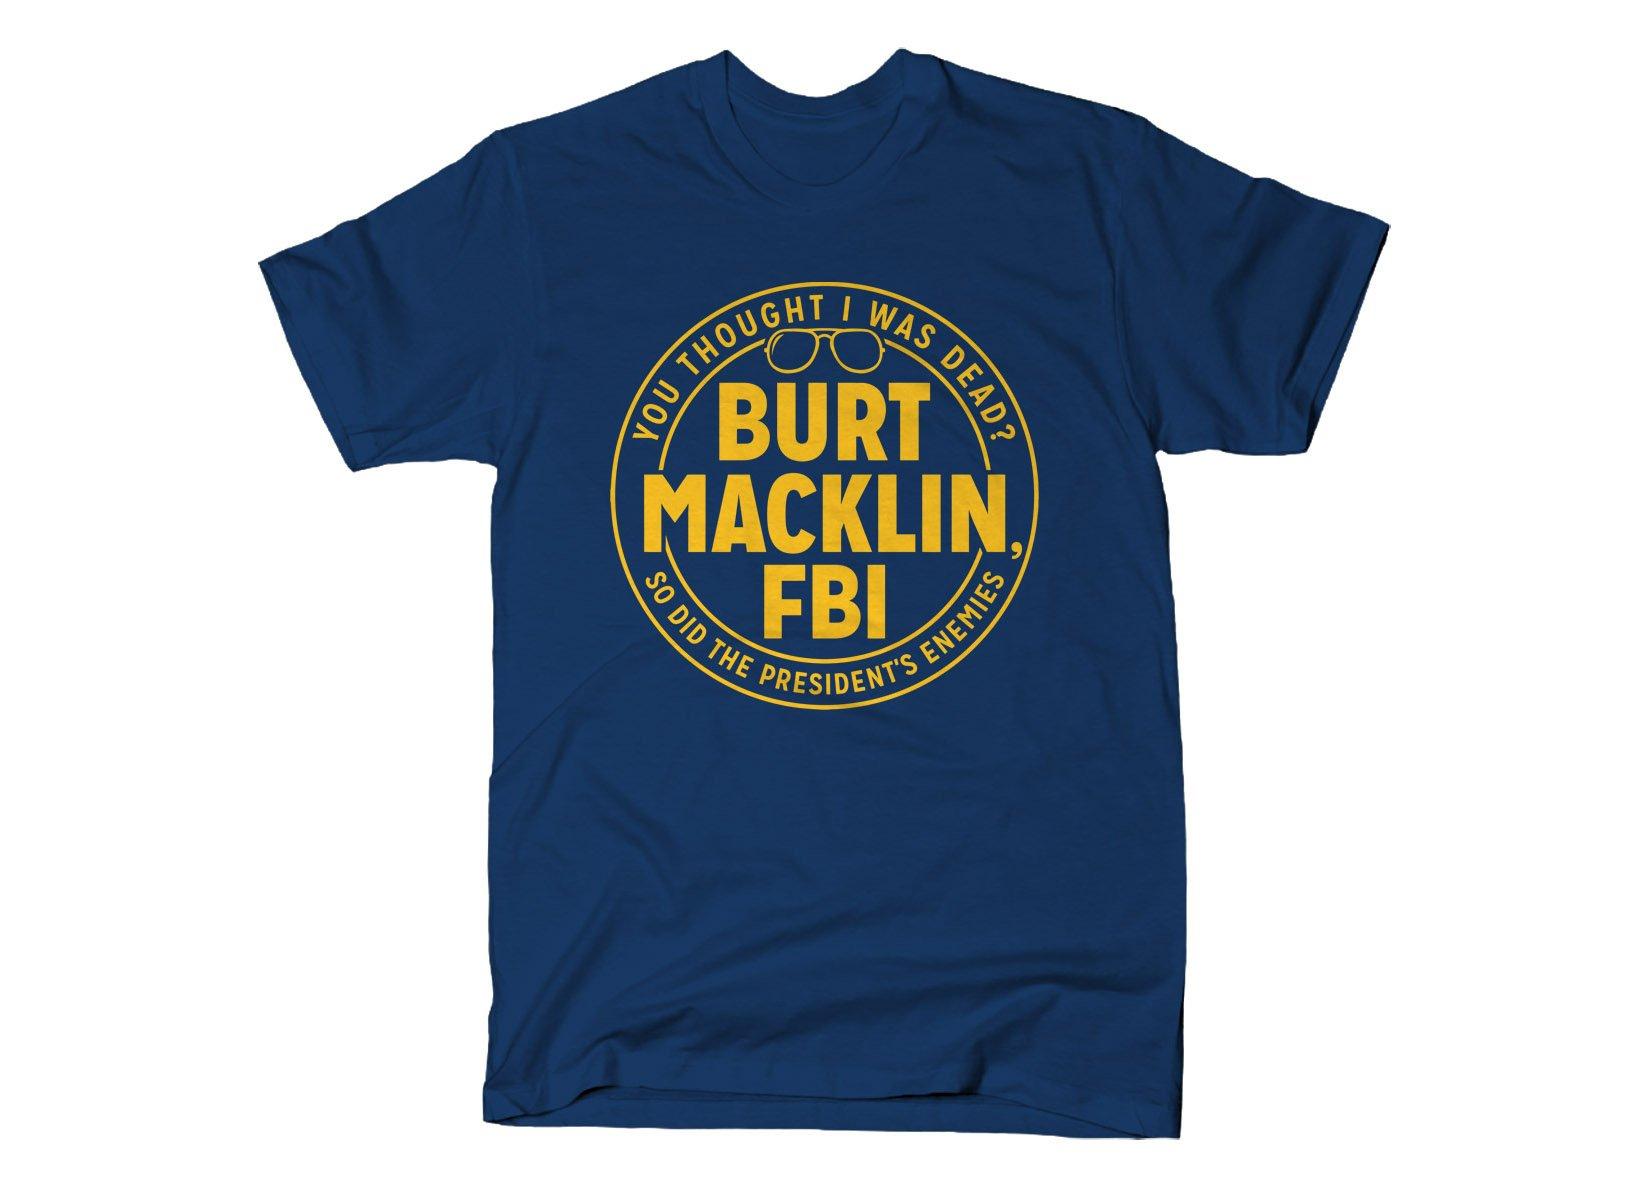 Burt Macklin, FBI on Mens T-Shirt